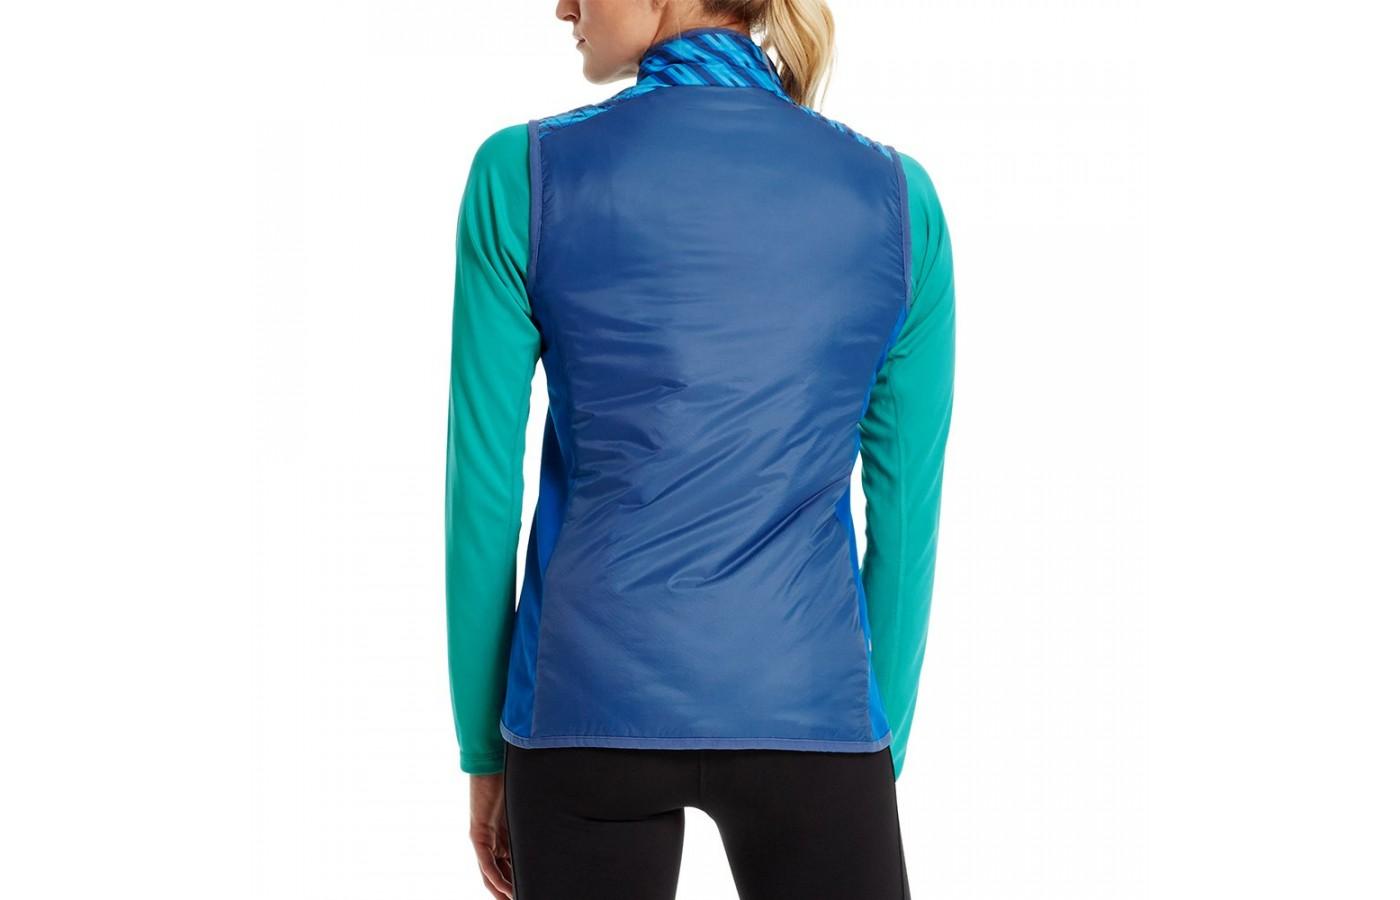 Mission VaporActive Shift Reversible Vest back 1